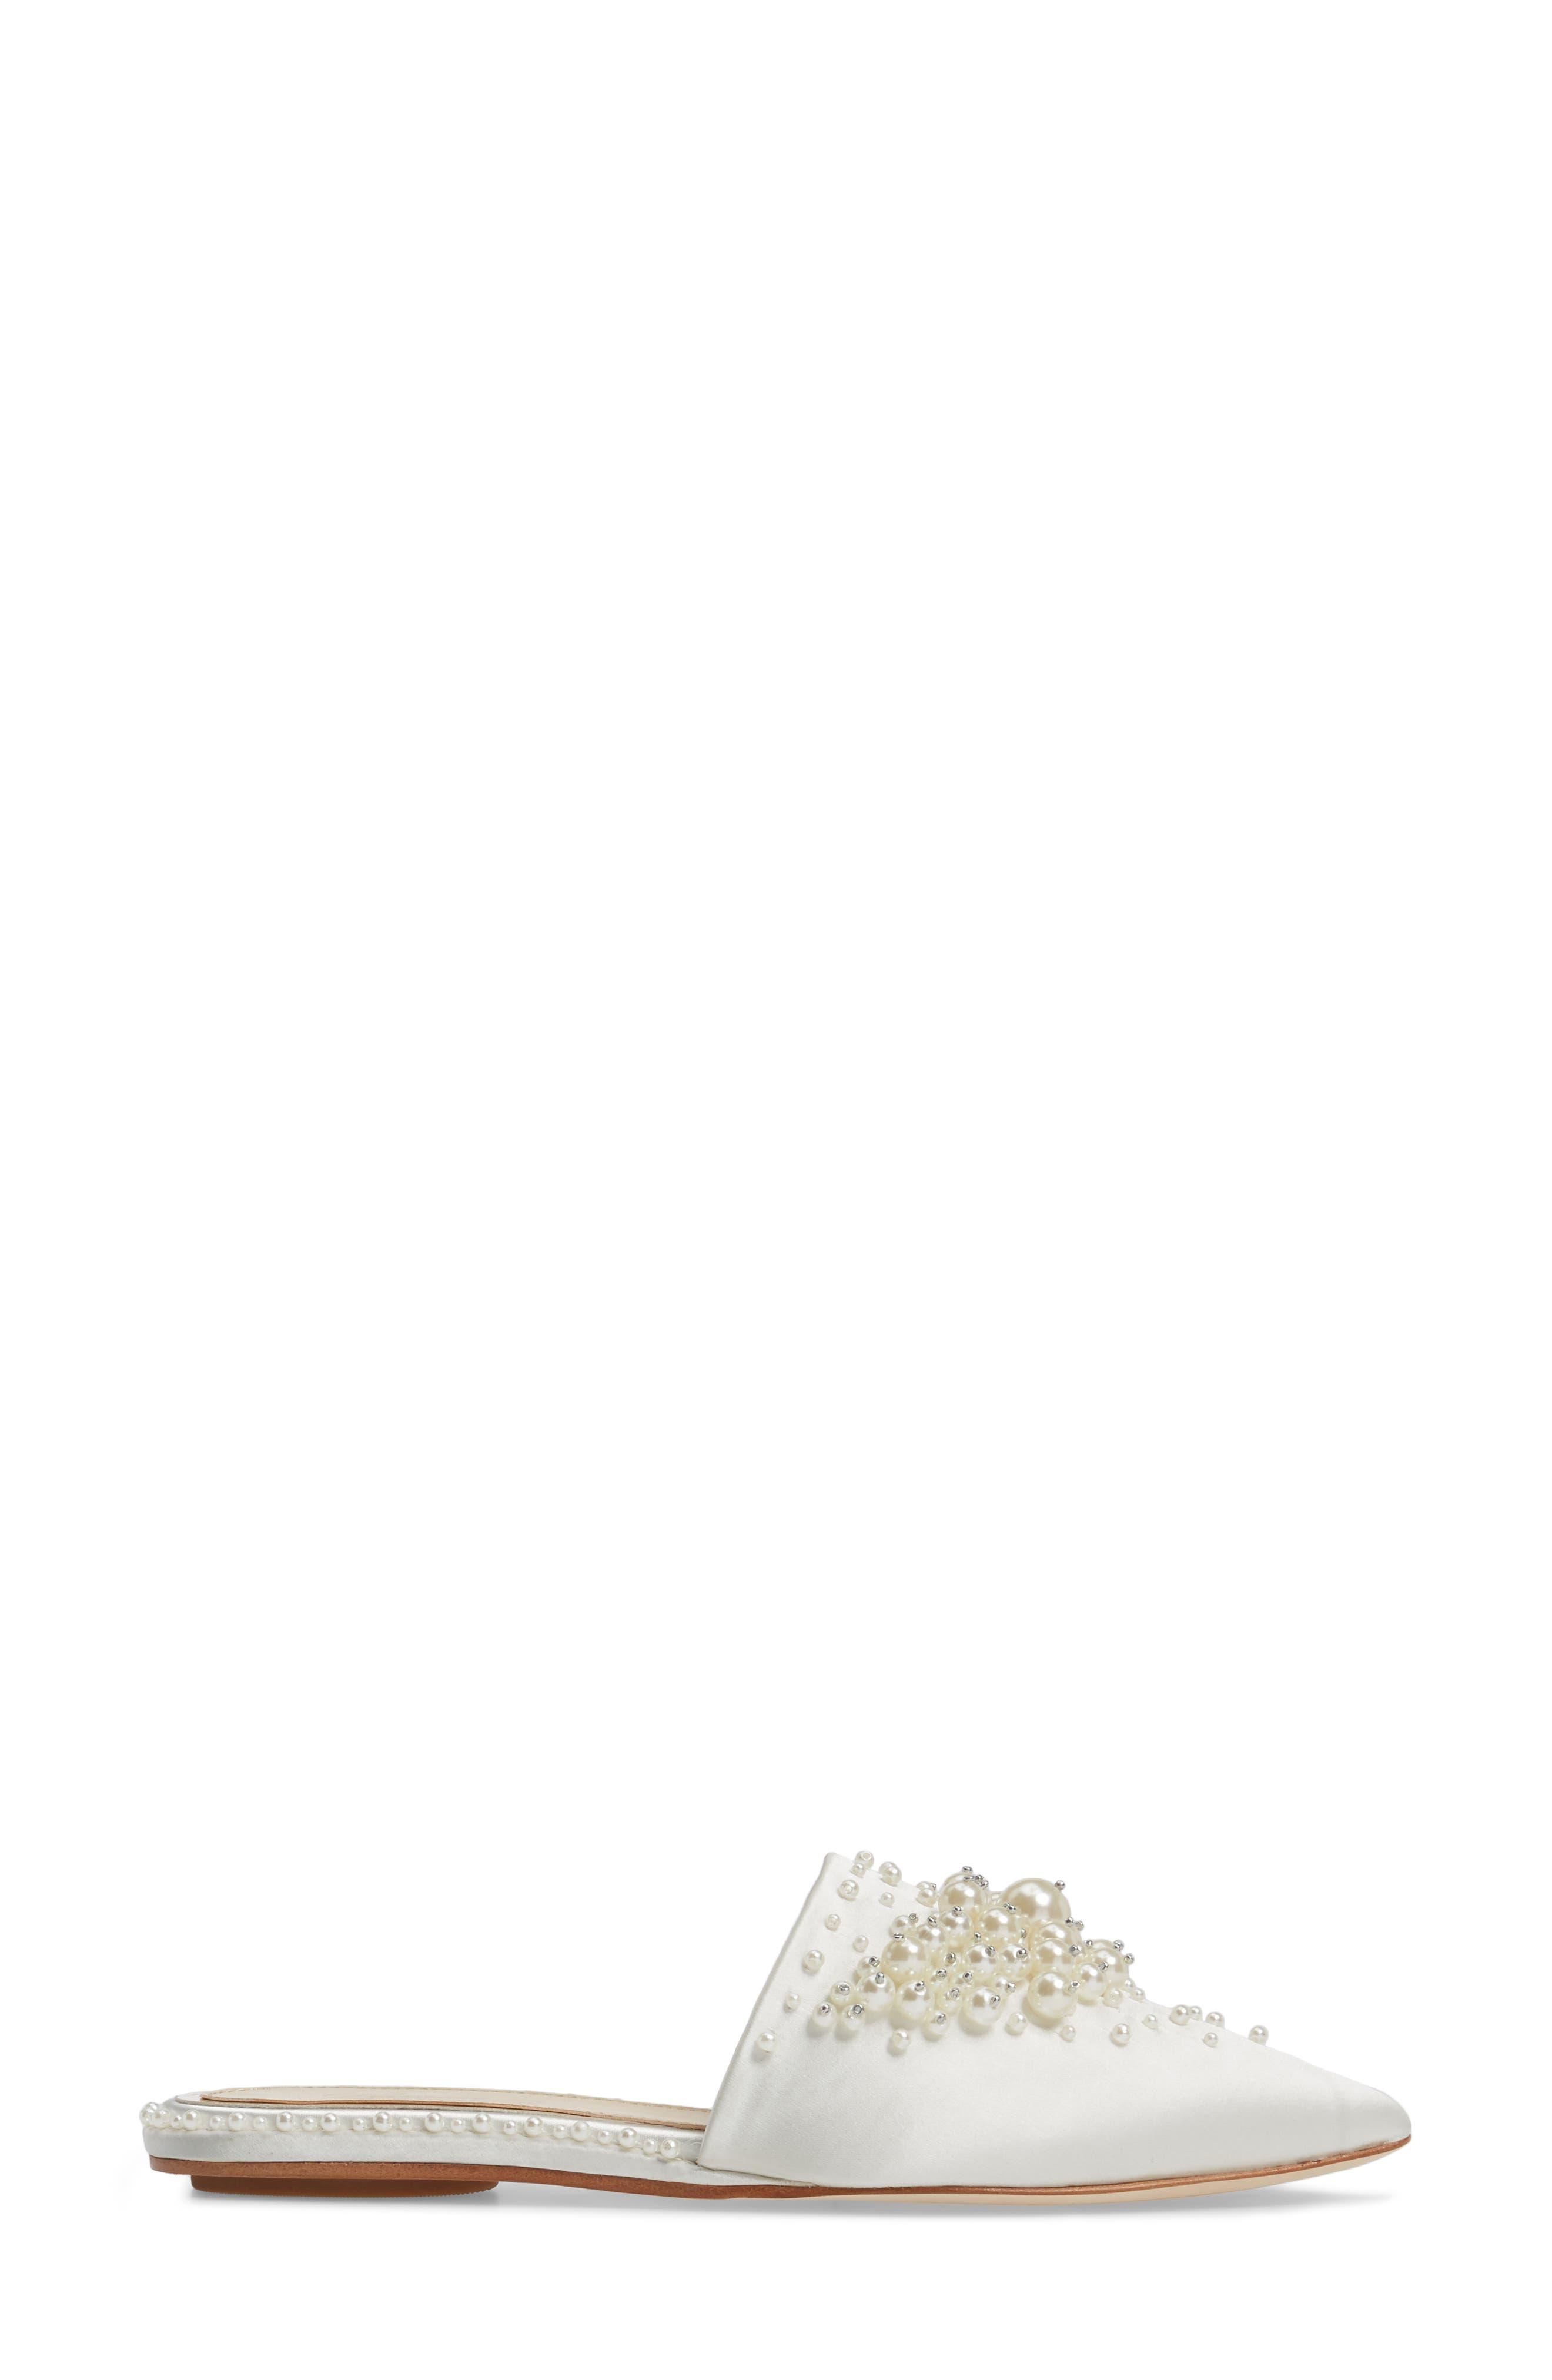 Casele Pointy Toe Mule,                             Alternate thumbnail 3, color,                             Ivory Satin